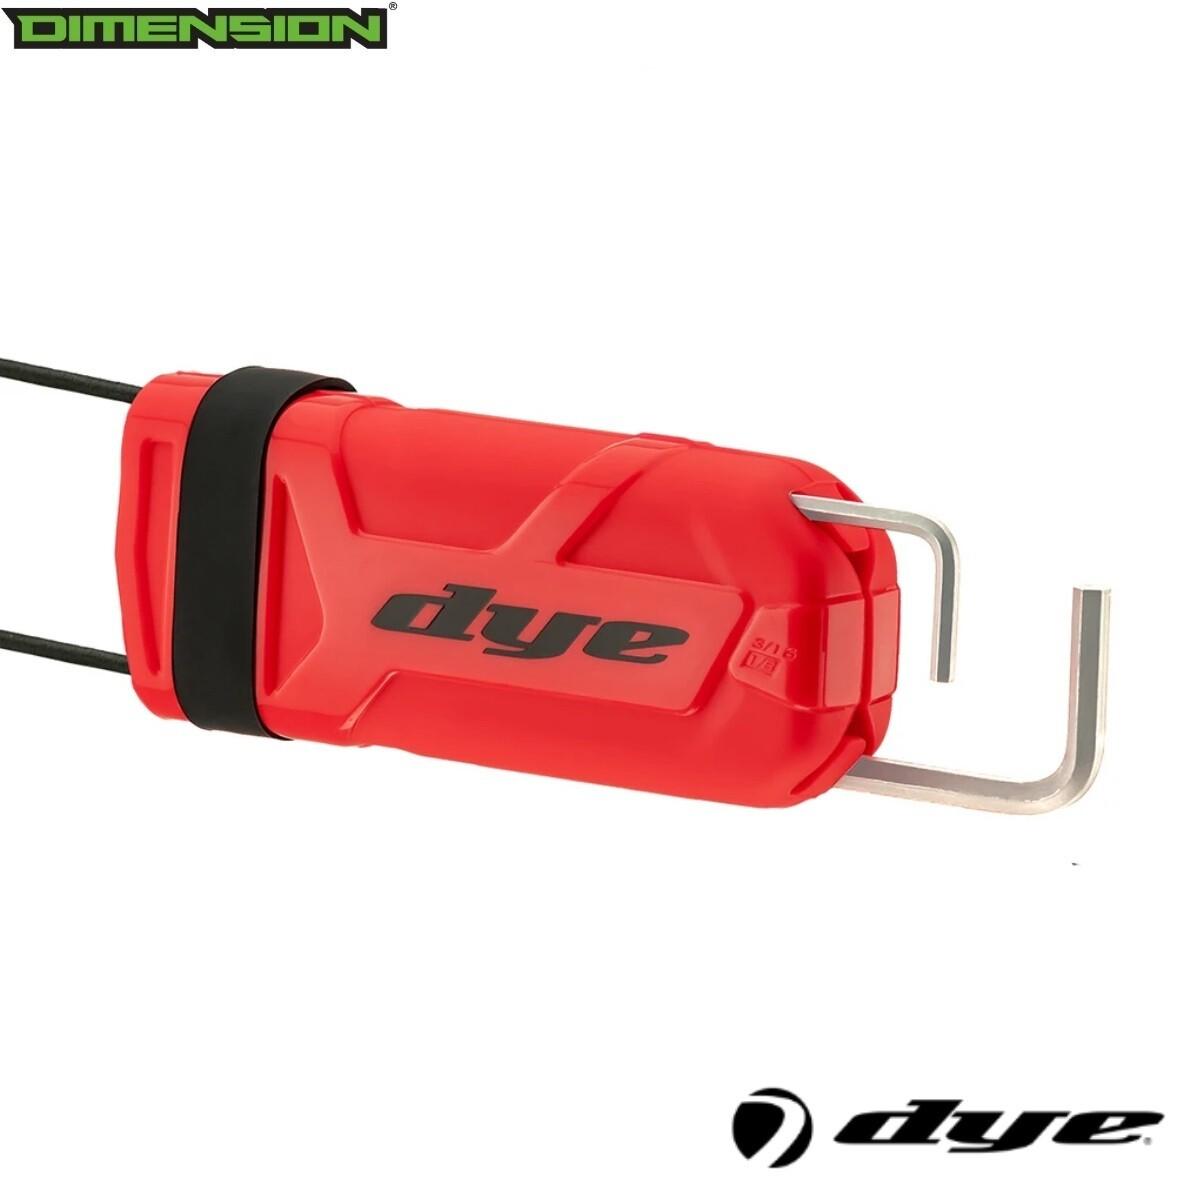 Dye Flex Barrel Cover - Red